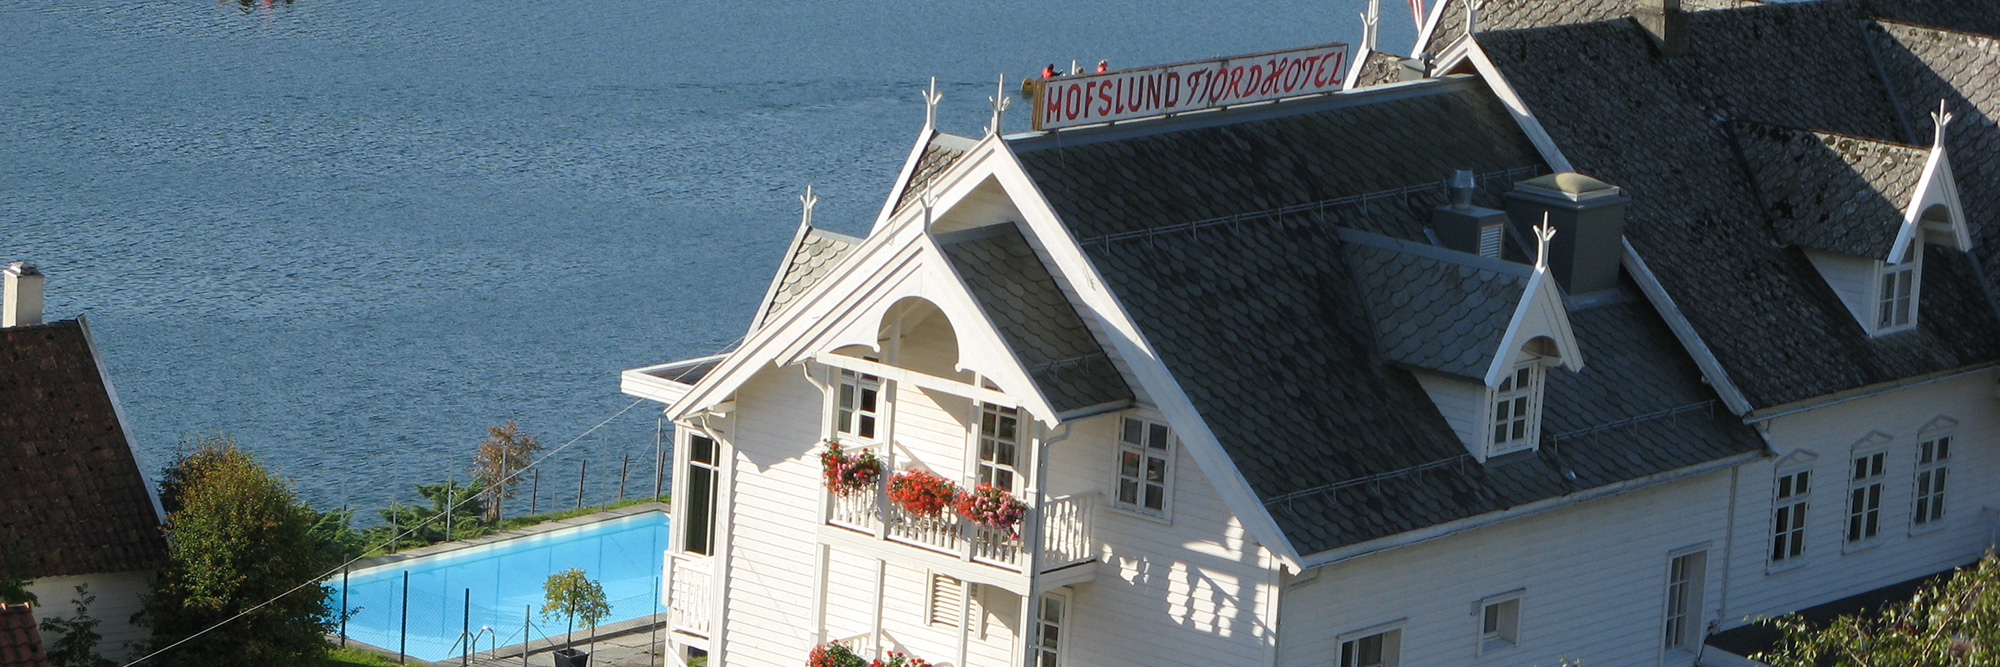 Hofslund Hotel - Sogndal